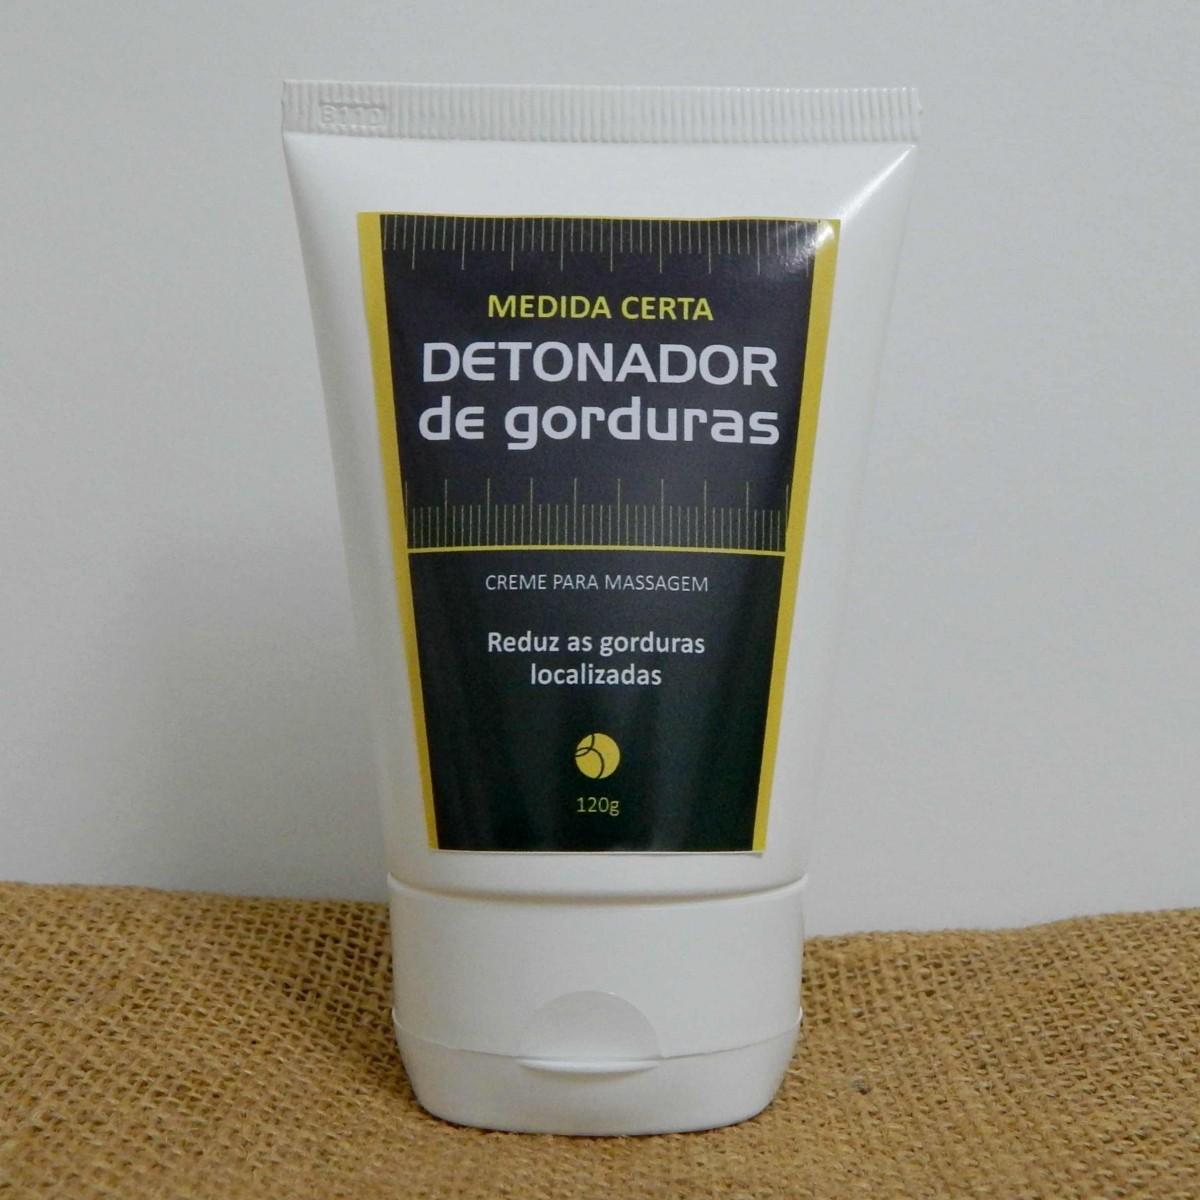 Creme Medida Certa - Detonador de Gorduras - 120g